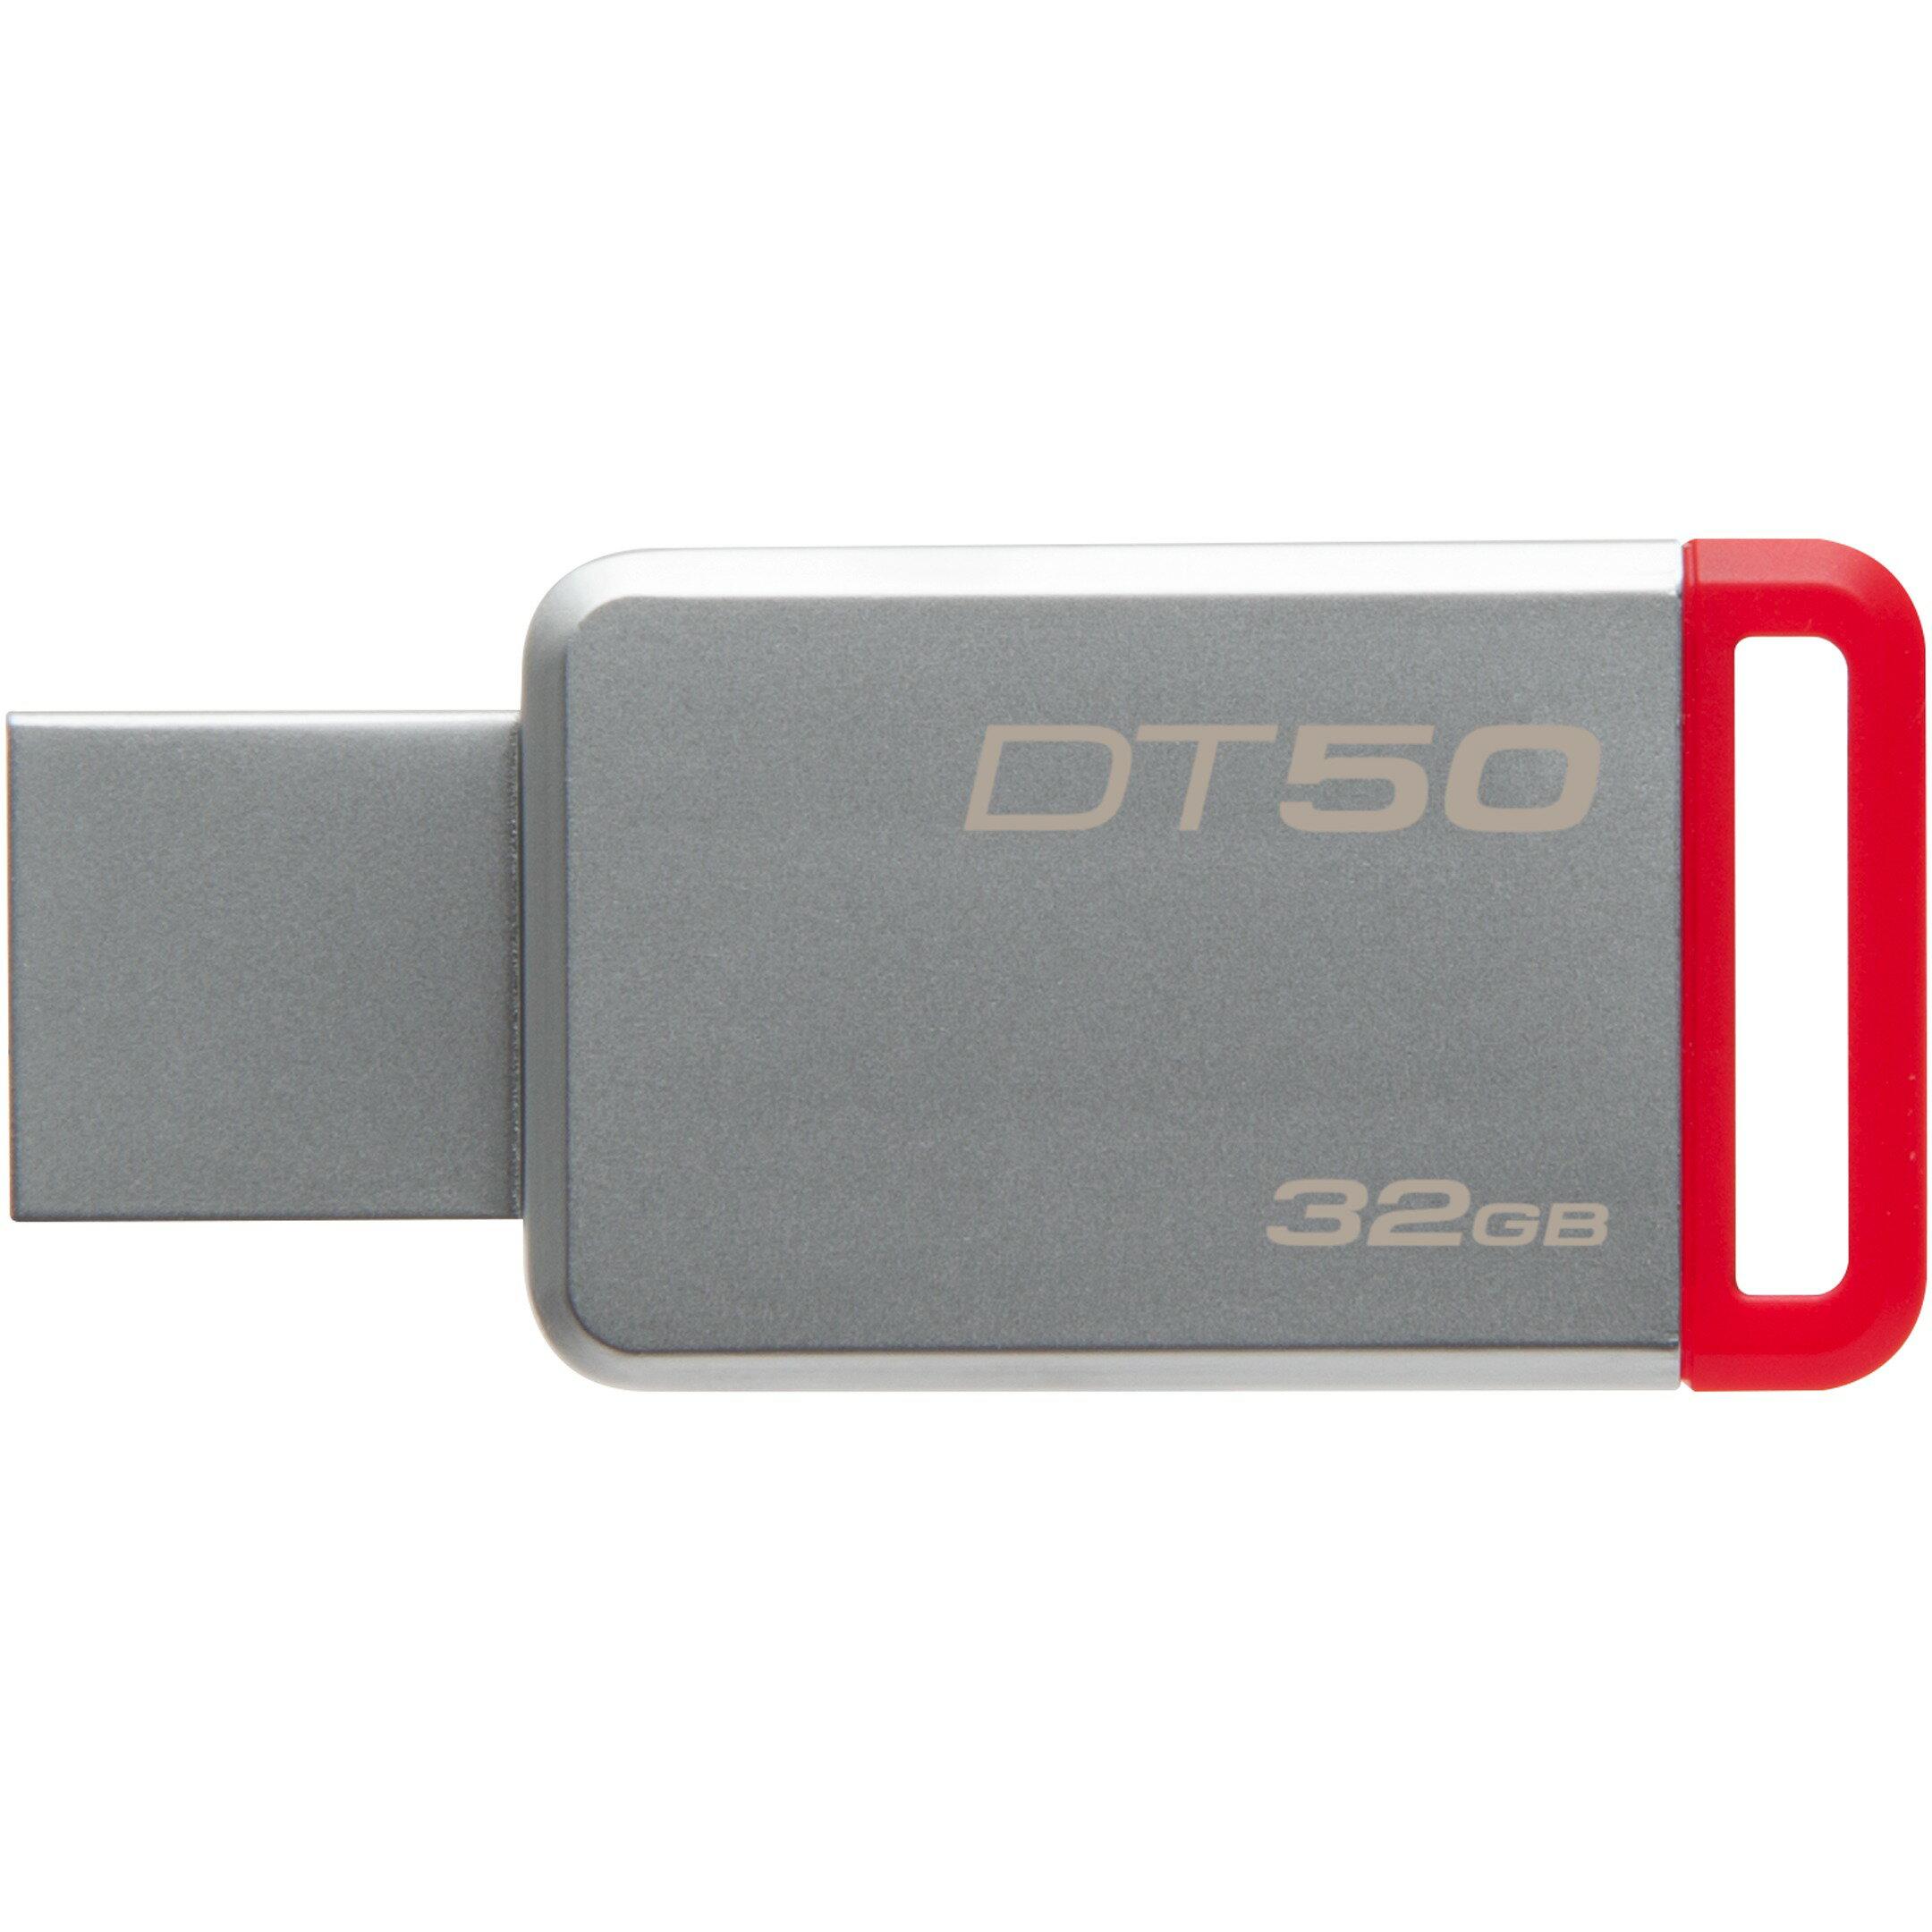 Kingston 32GB DataTraveler 50 32G DT50 USB 3.1 Gen 1 USB 3.0 110MB/s Flash Pen Thumb Drive DT50/32GB 1